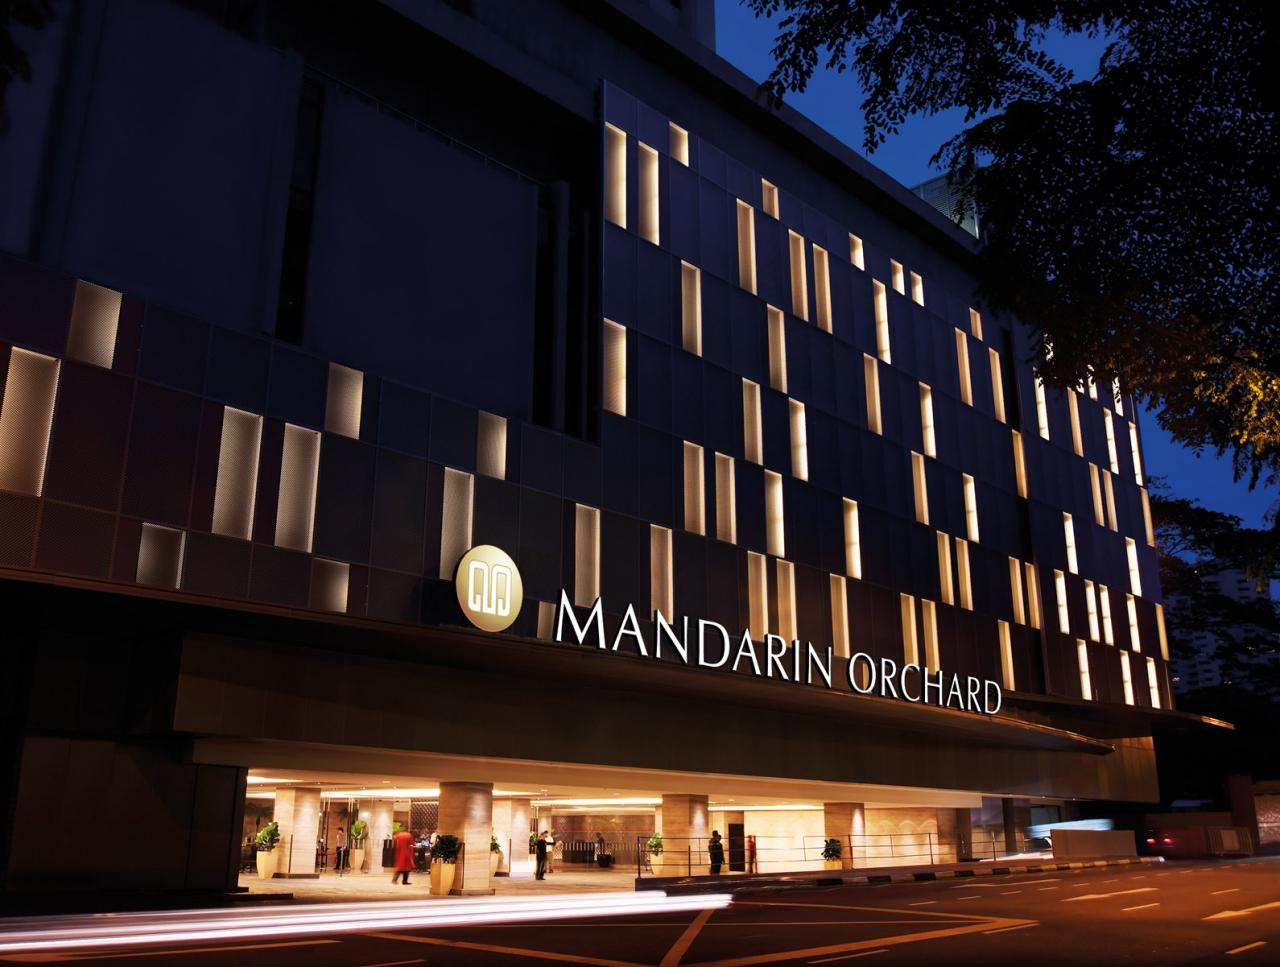 Mandarin-Orchard-Singapore-Night-Facade_01